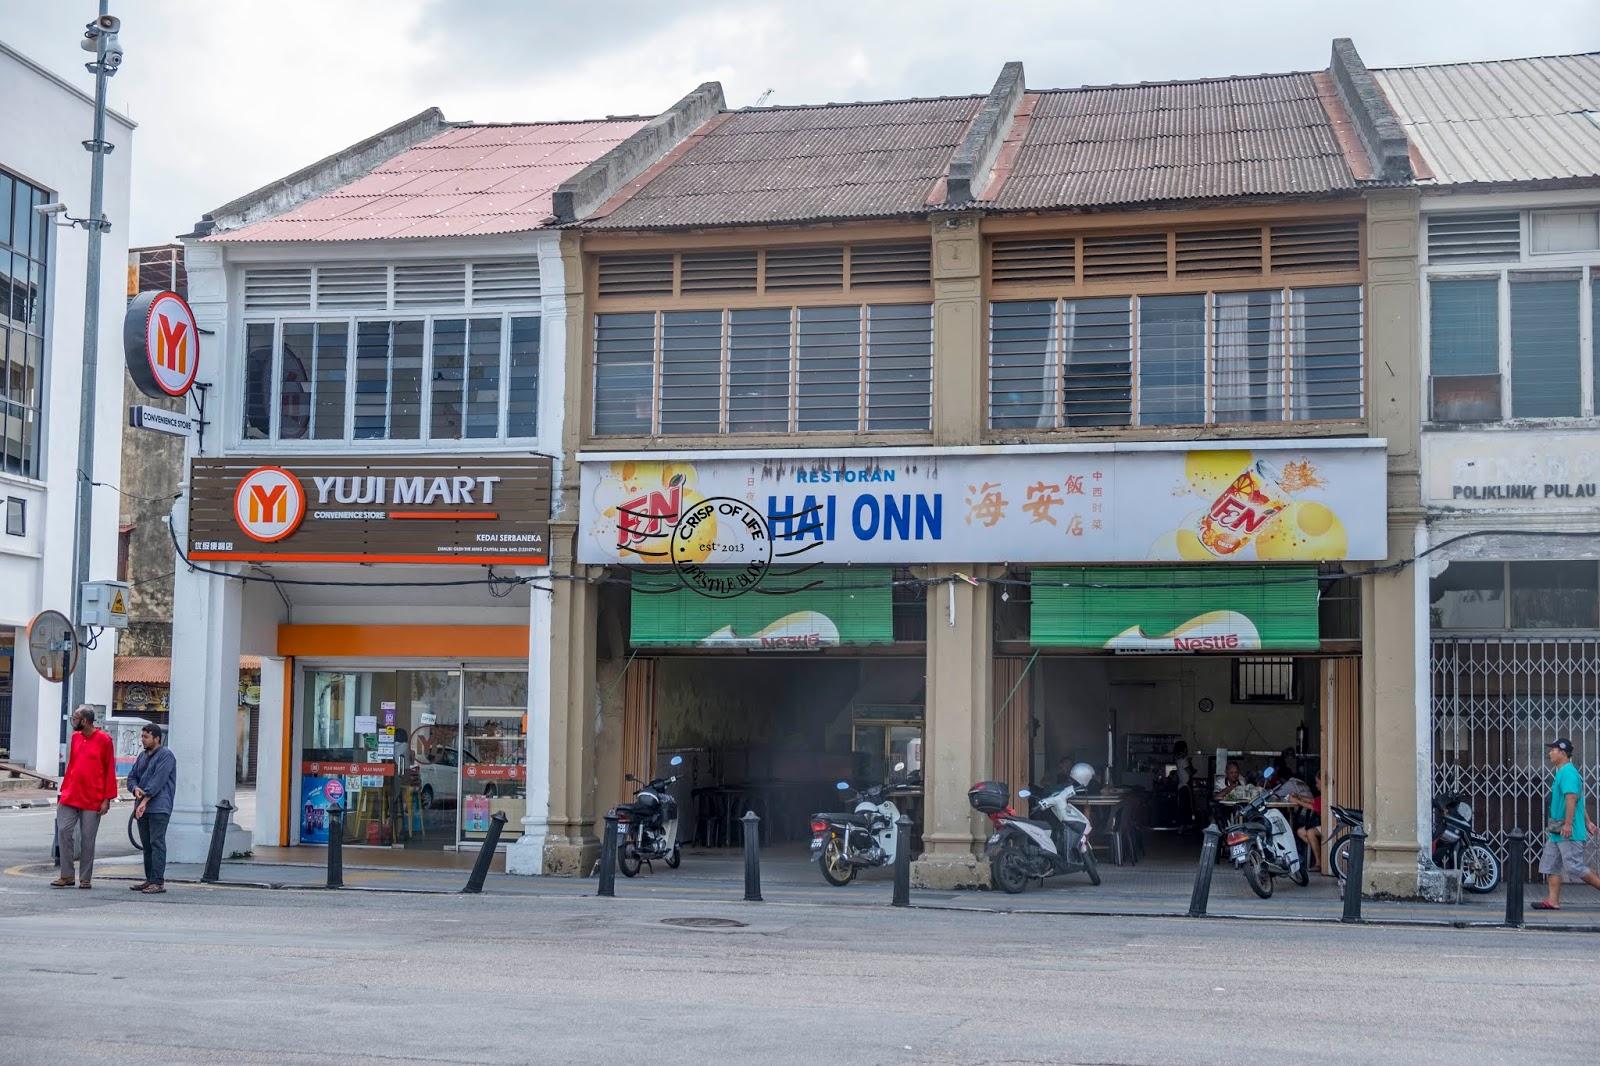 80 years Hainanese Kopitiam in Georgetown - Hai Onn Restaurant @ Jalan Burmah